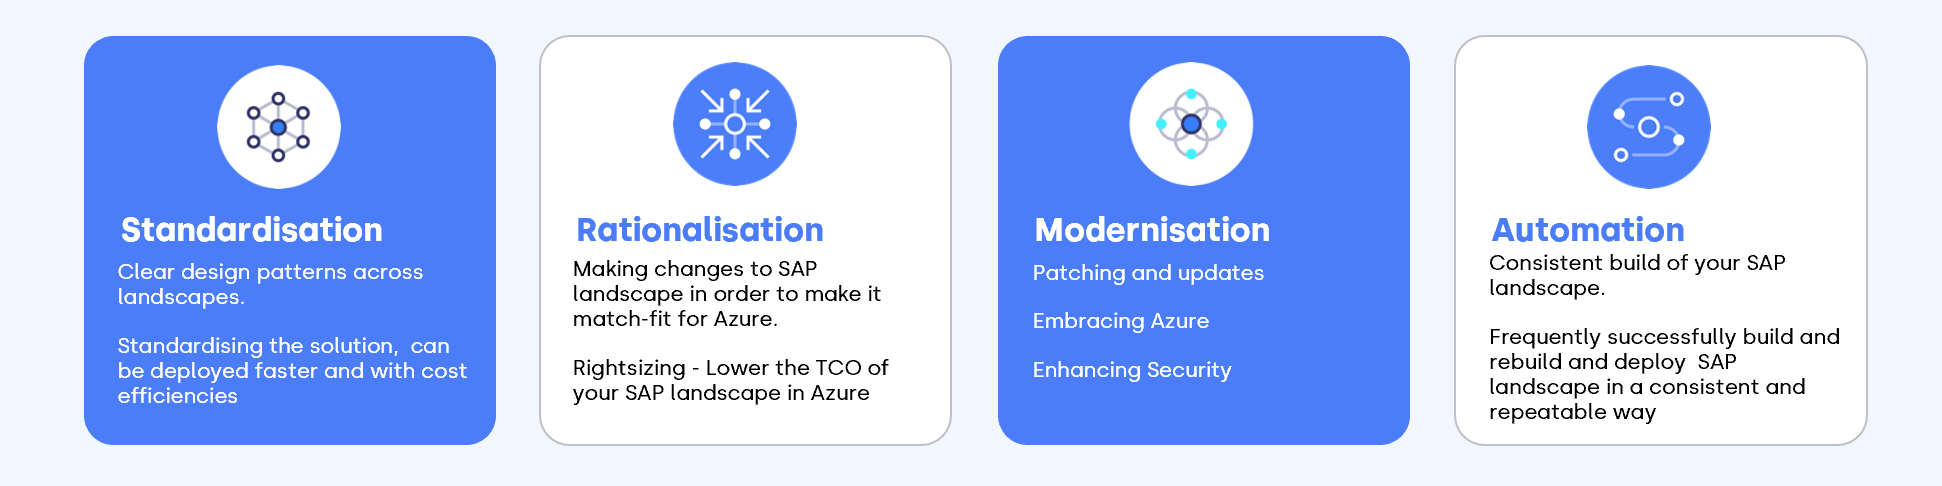 Migrating an SAP landscape to Azure should be a transformation.